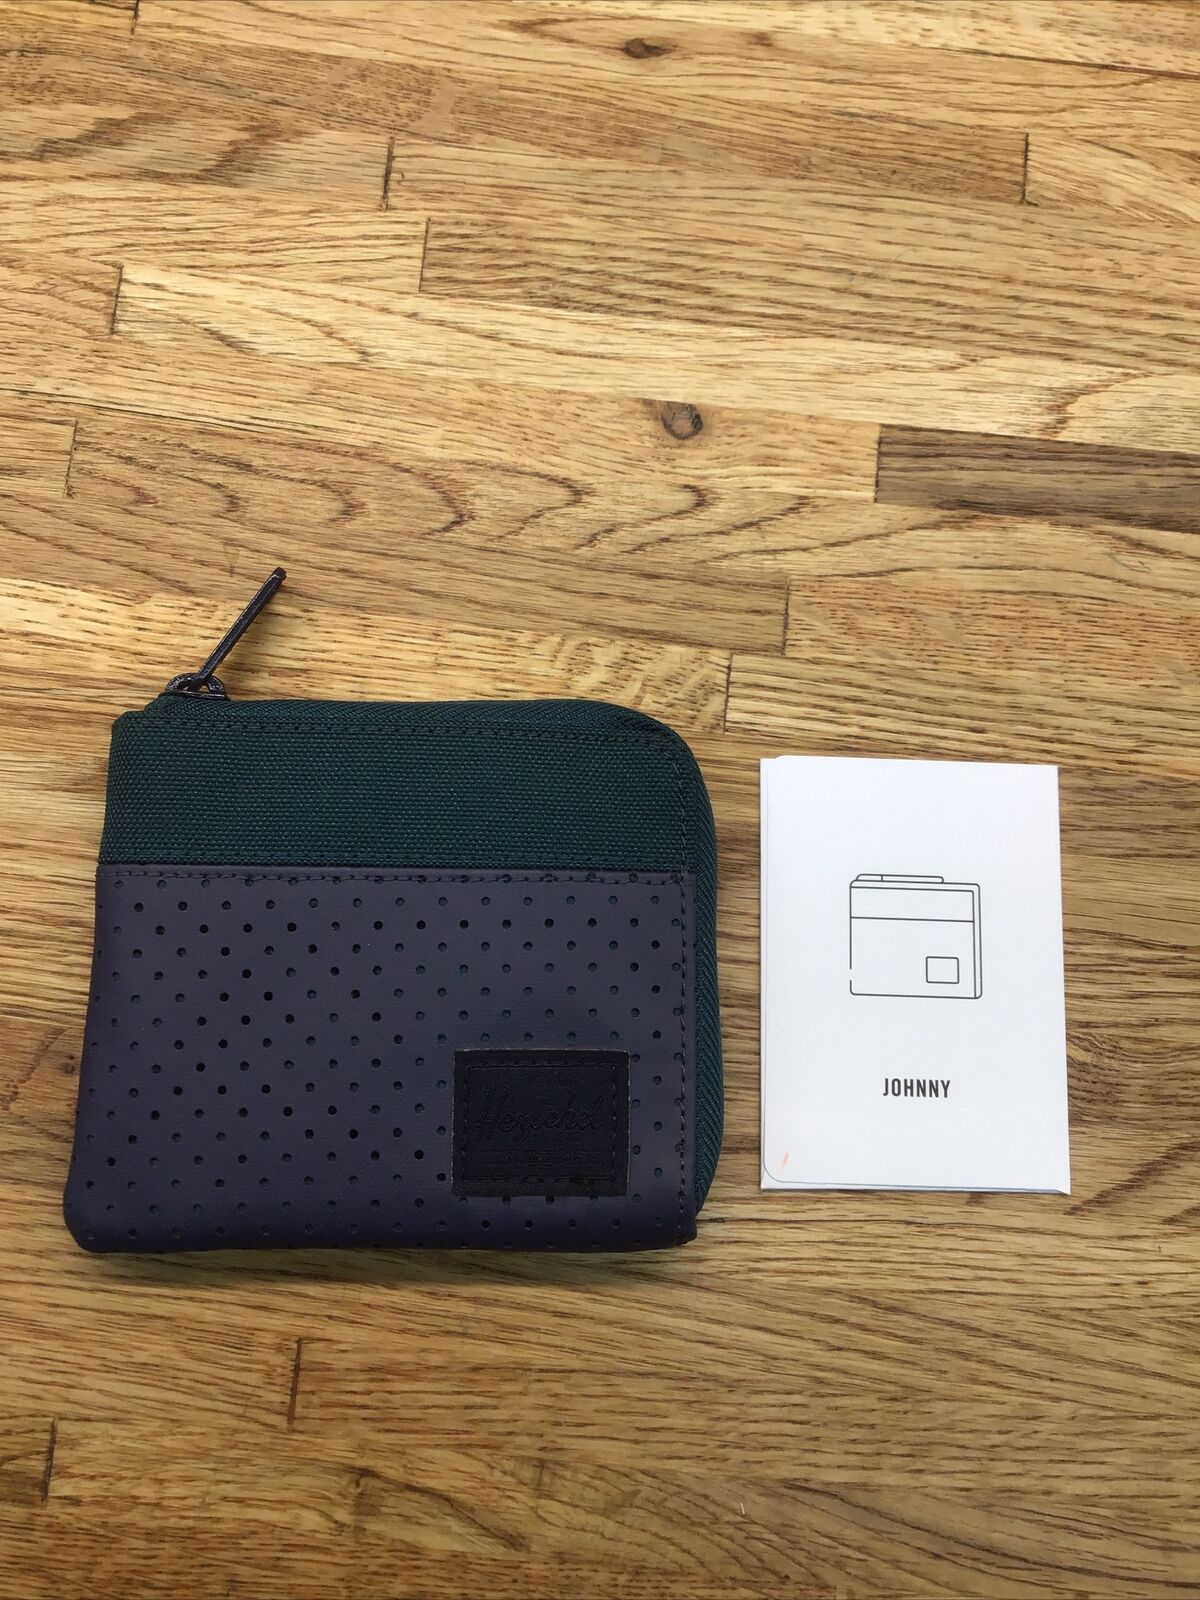 Herschel Supply Co Johnny RFID Blue/ Green Wallet One Size New PP-6